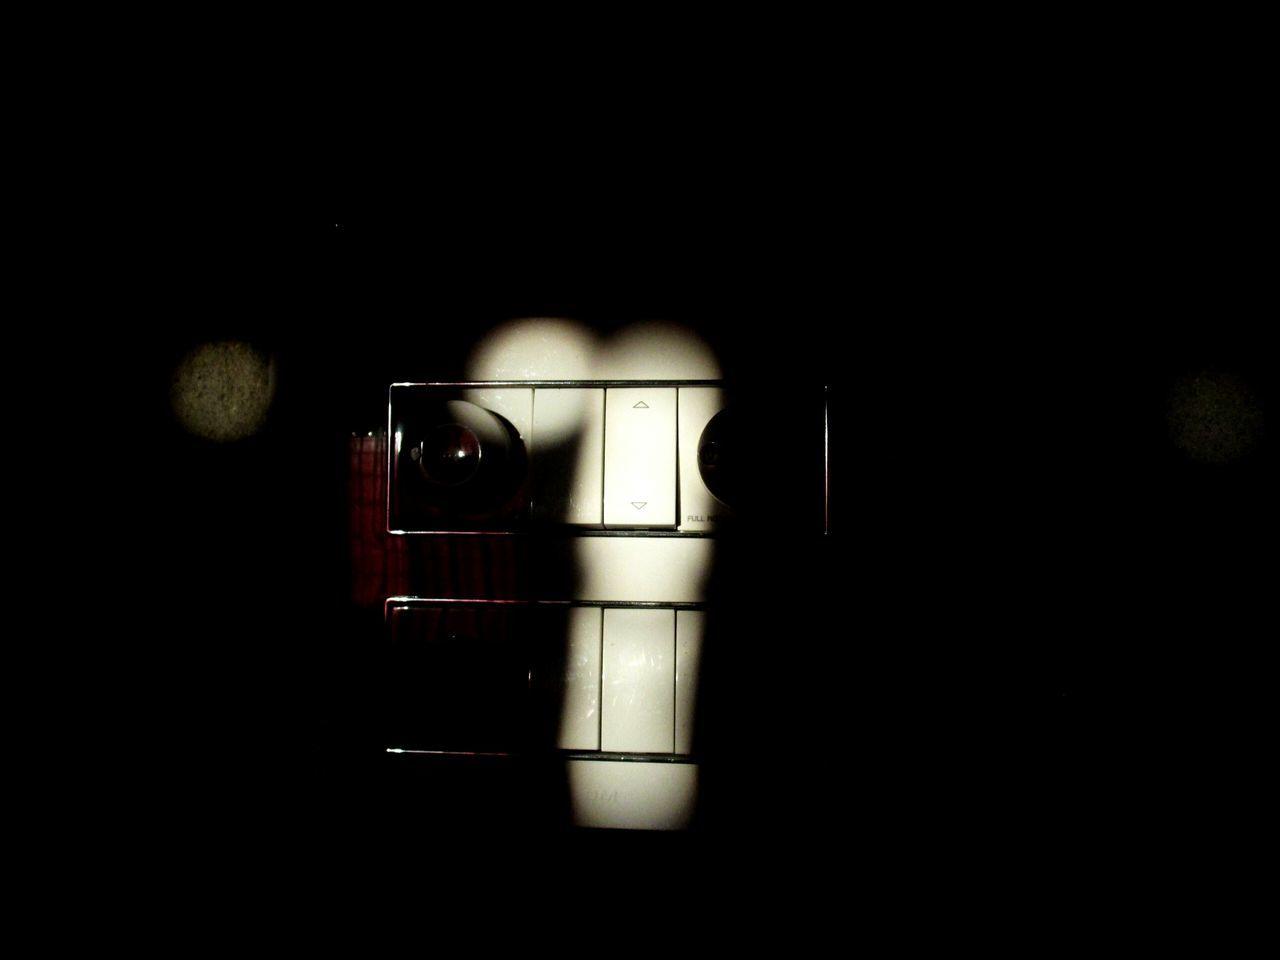 Indoors  Close-up Switchlightphotography Switchlightproject Switchboard Switchlight Switch On Switch It Up Eyemphotography Eyem Eyem Best Shots Eyem Gallery Shotoftheday Sunset Darkshot  Darkshots Resist